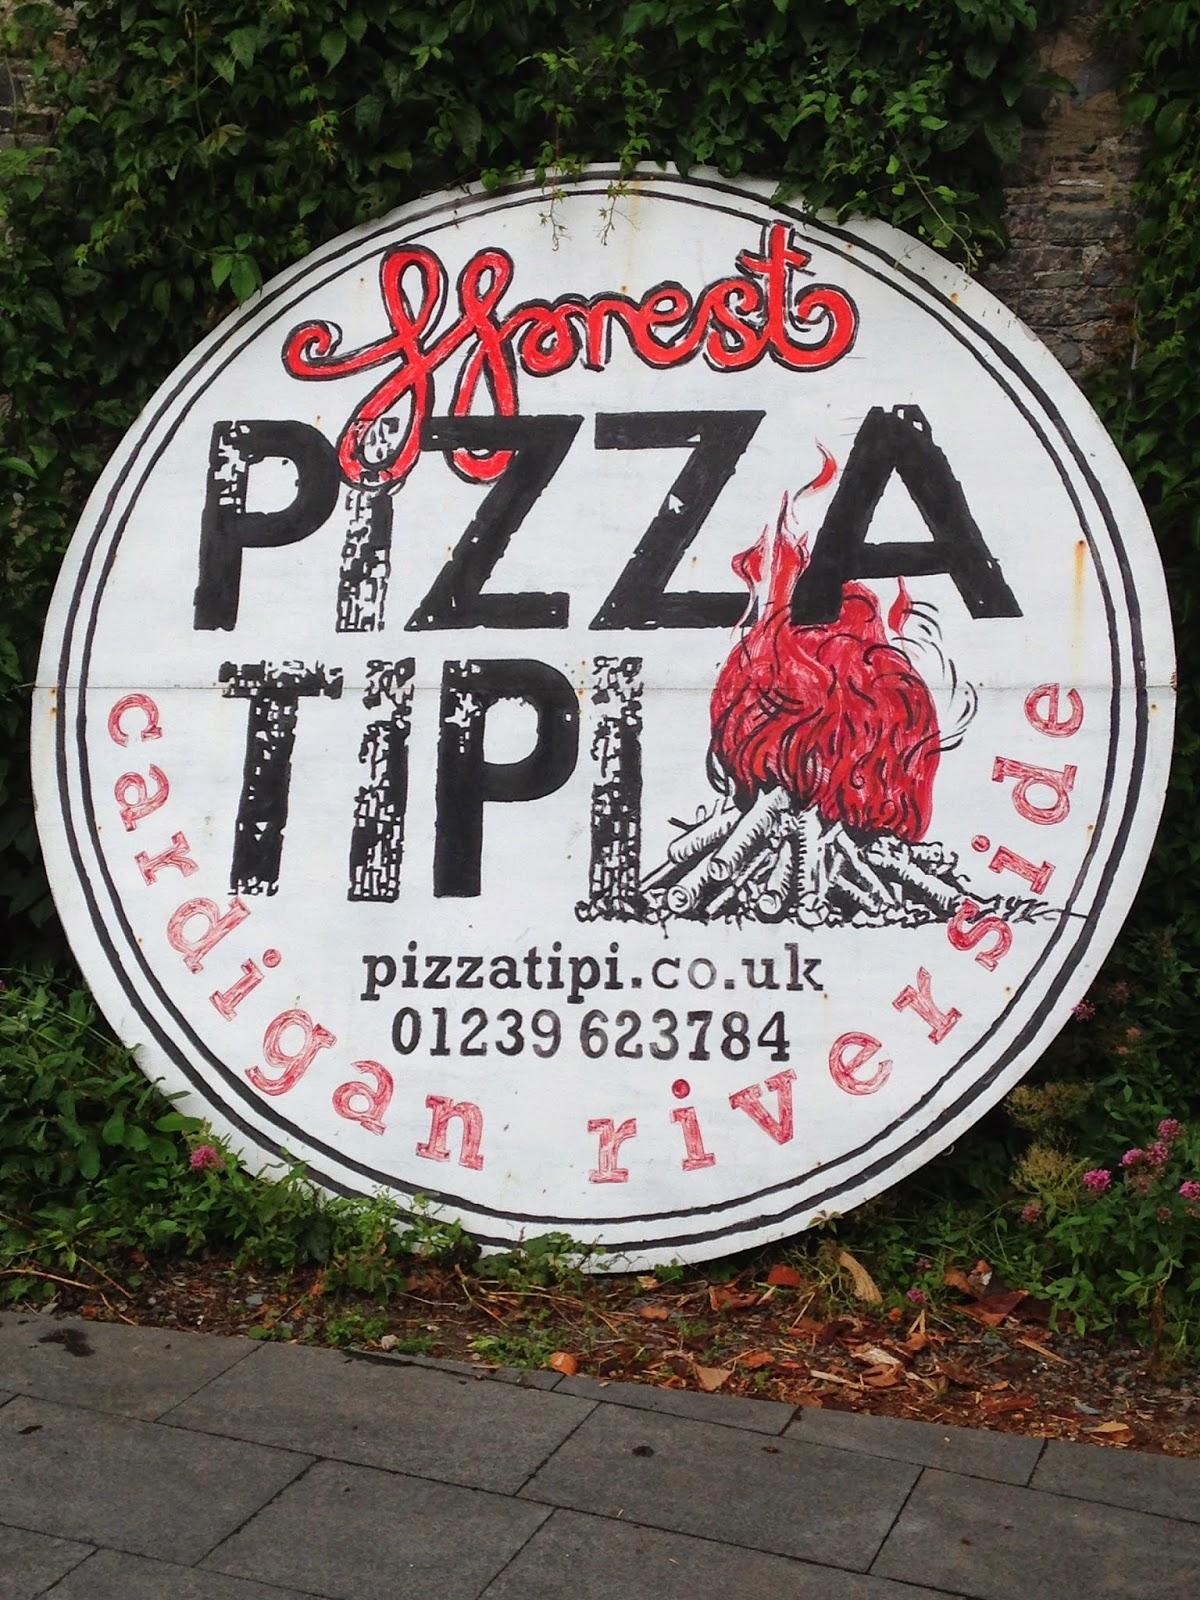 Cardigan Pizza Tipi